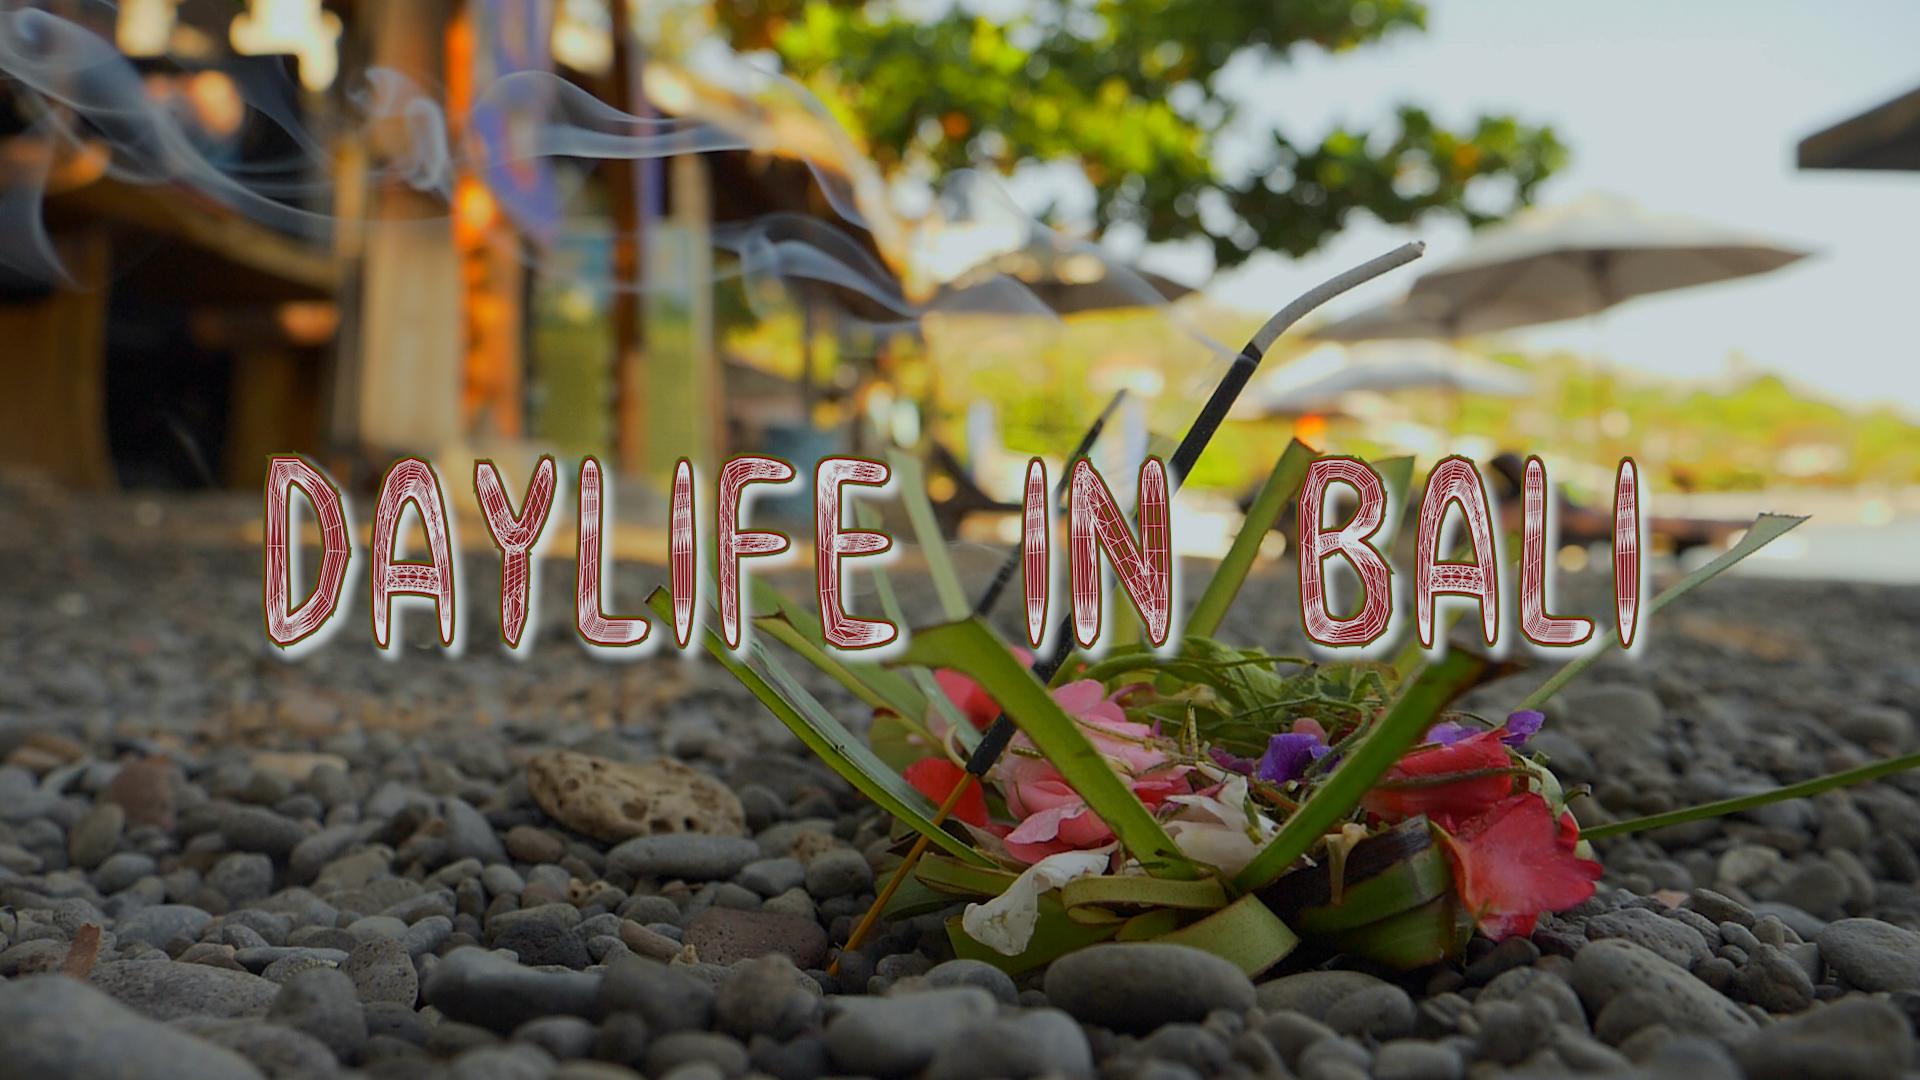 Daylife in Bali